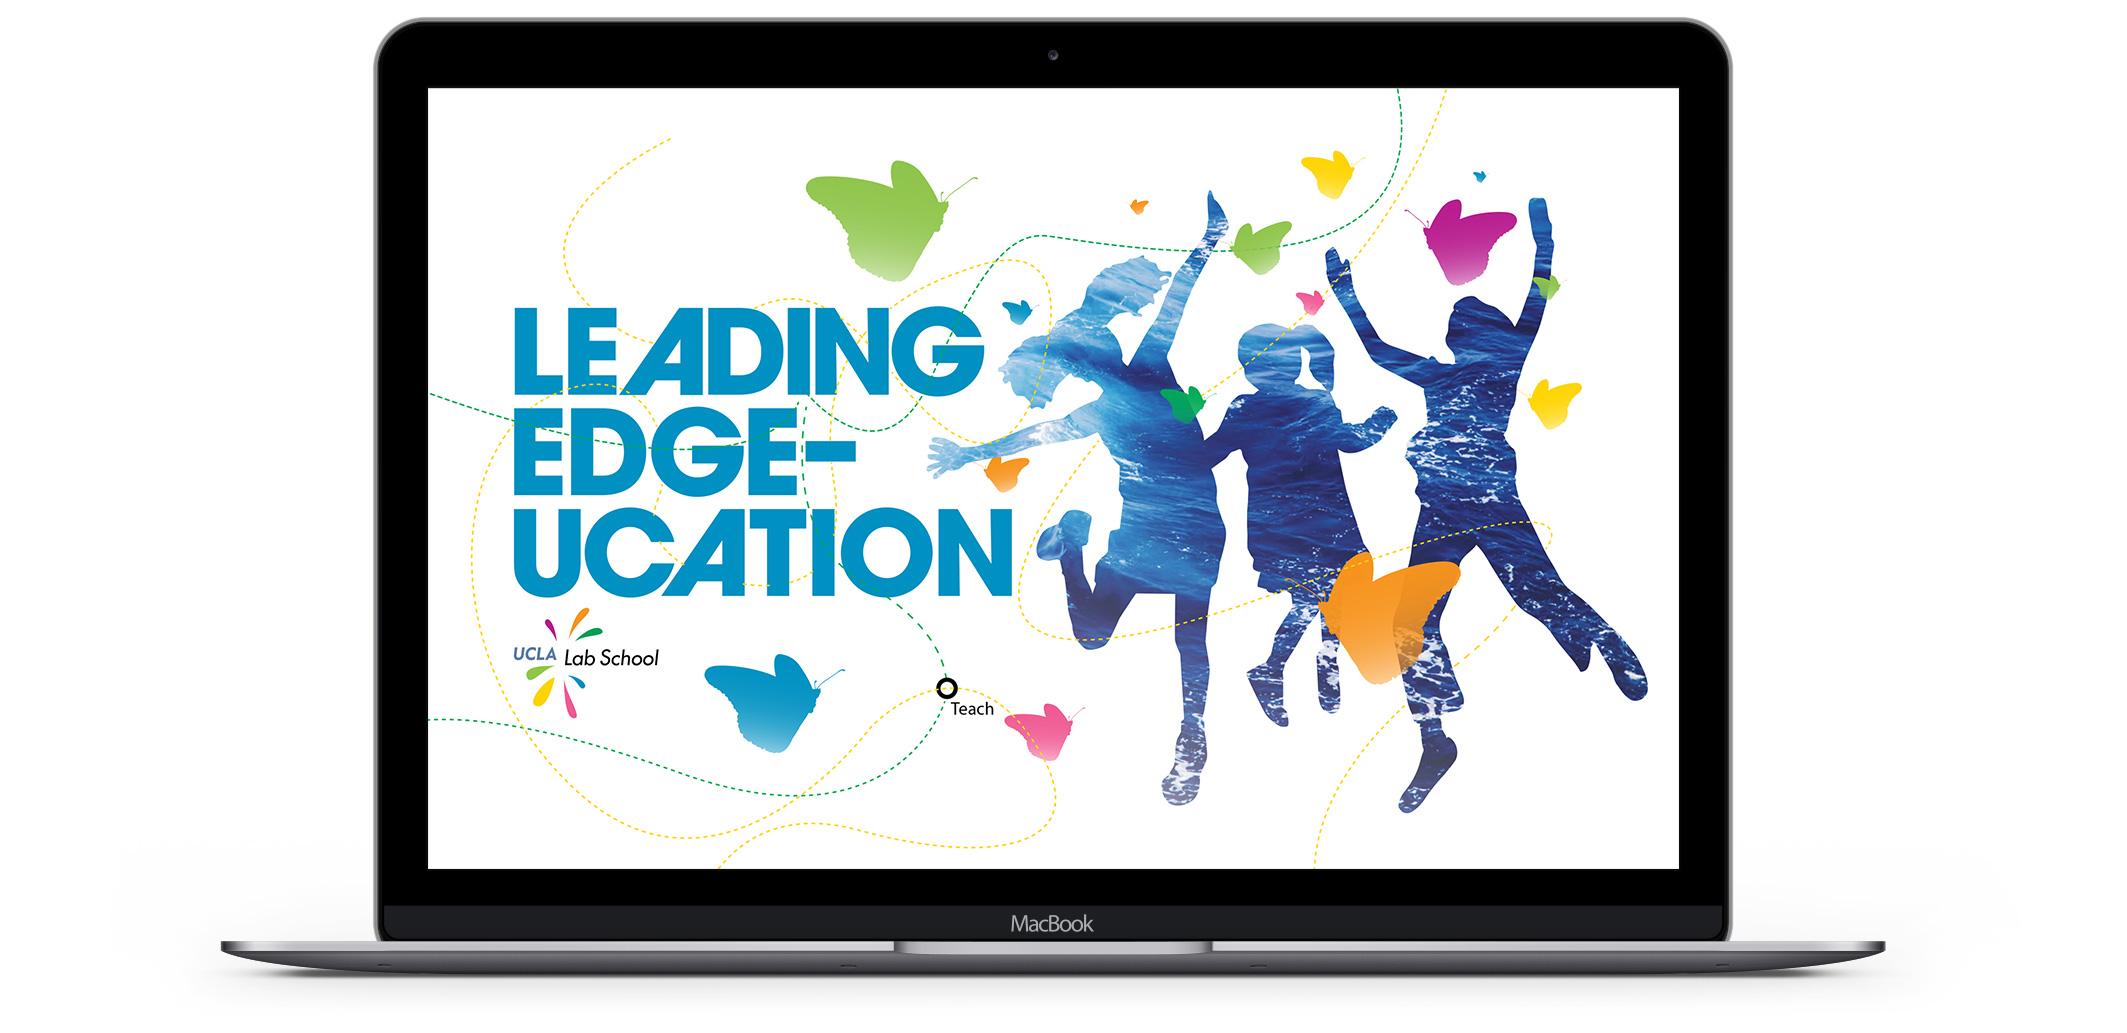 UCLA_Lab_School-Laptop-TaglineC@2x.jpg